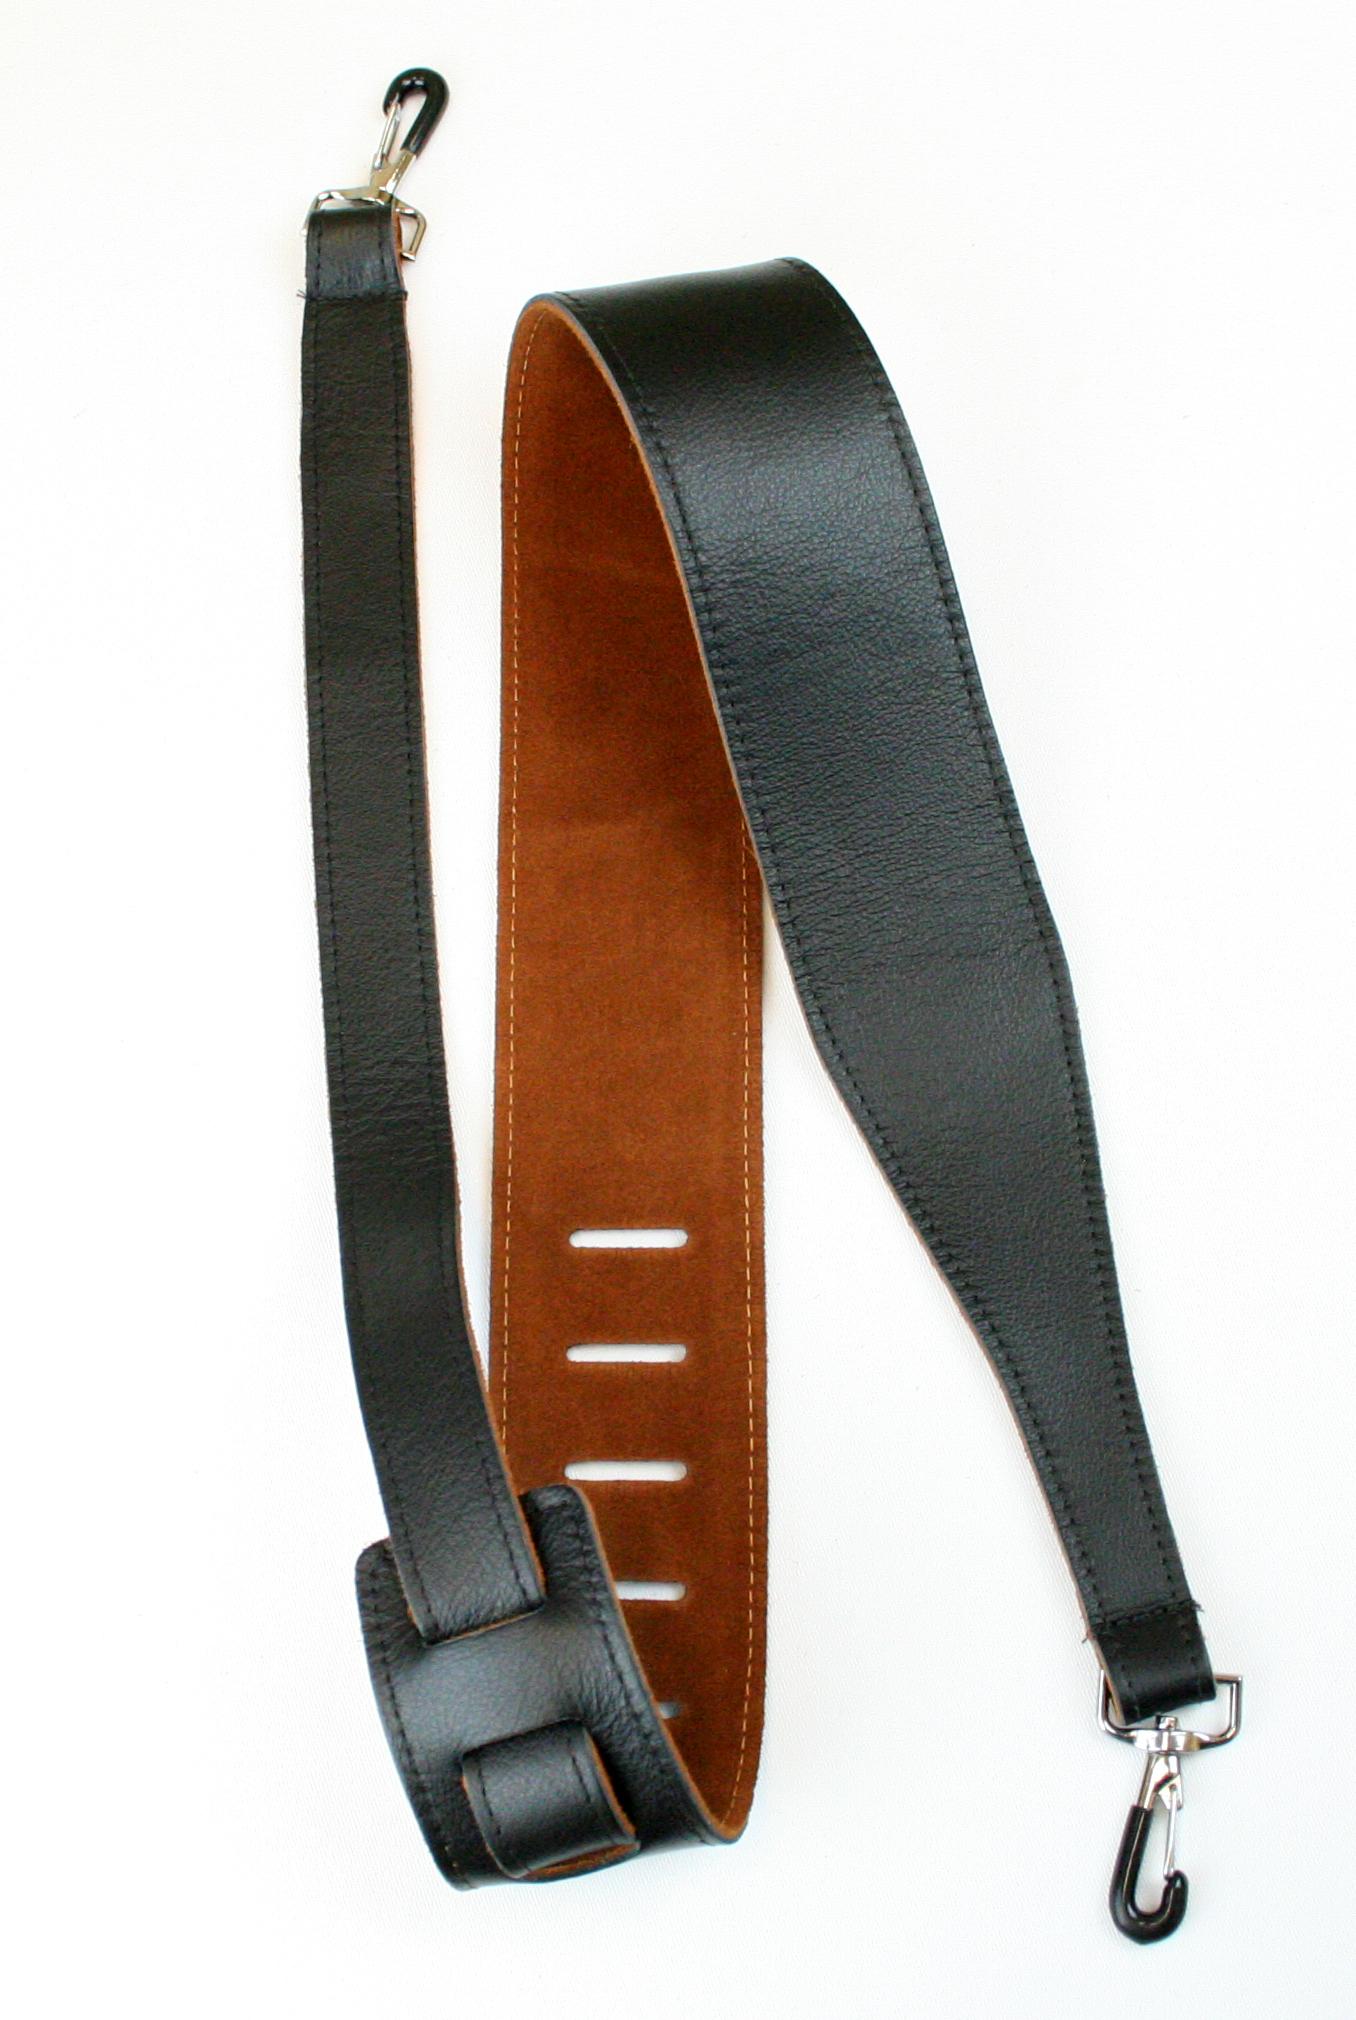 D'Addario 25SLBNJ02-DX Garment Leather Banjo Strap with Coated Metal Hooks